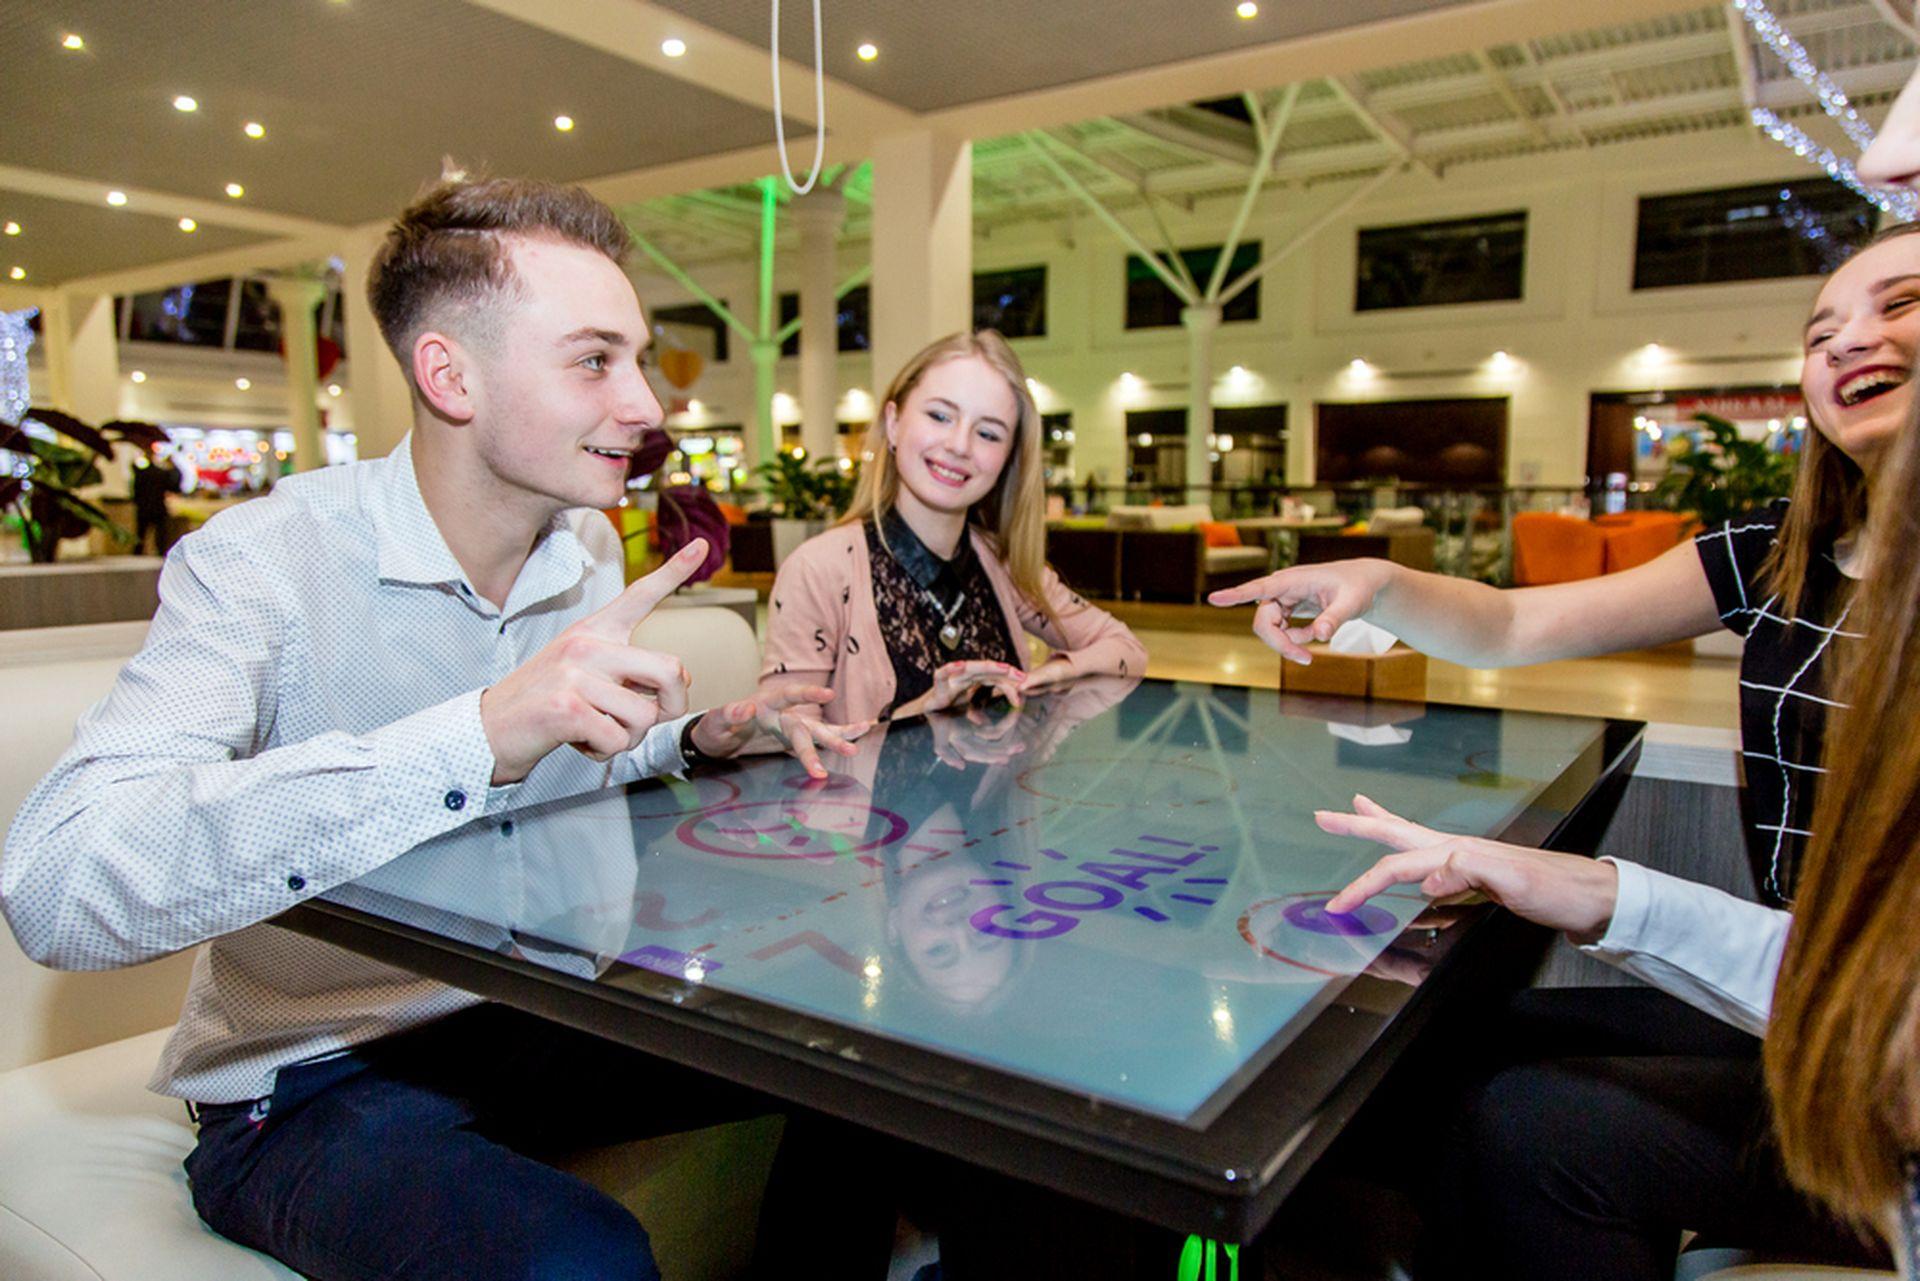 Українські смарт-столи встановлять у київських ТРЦ та ресторанах